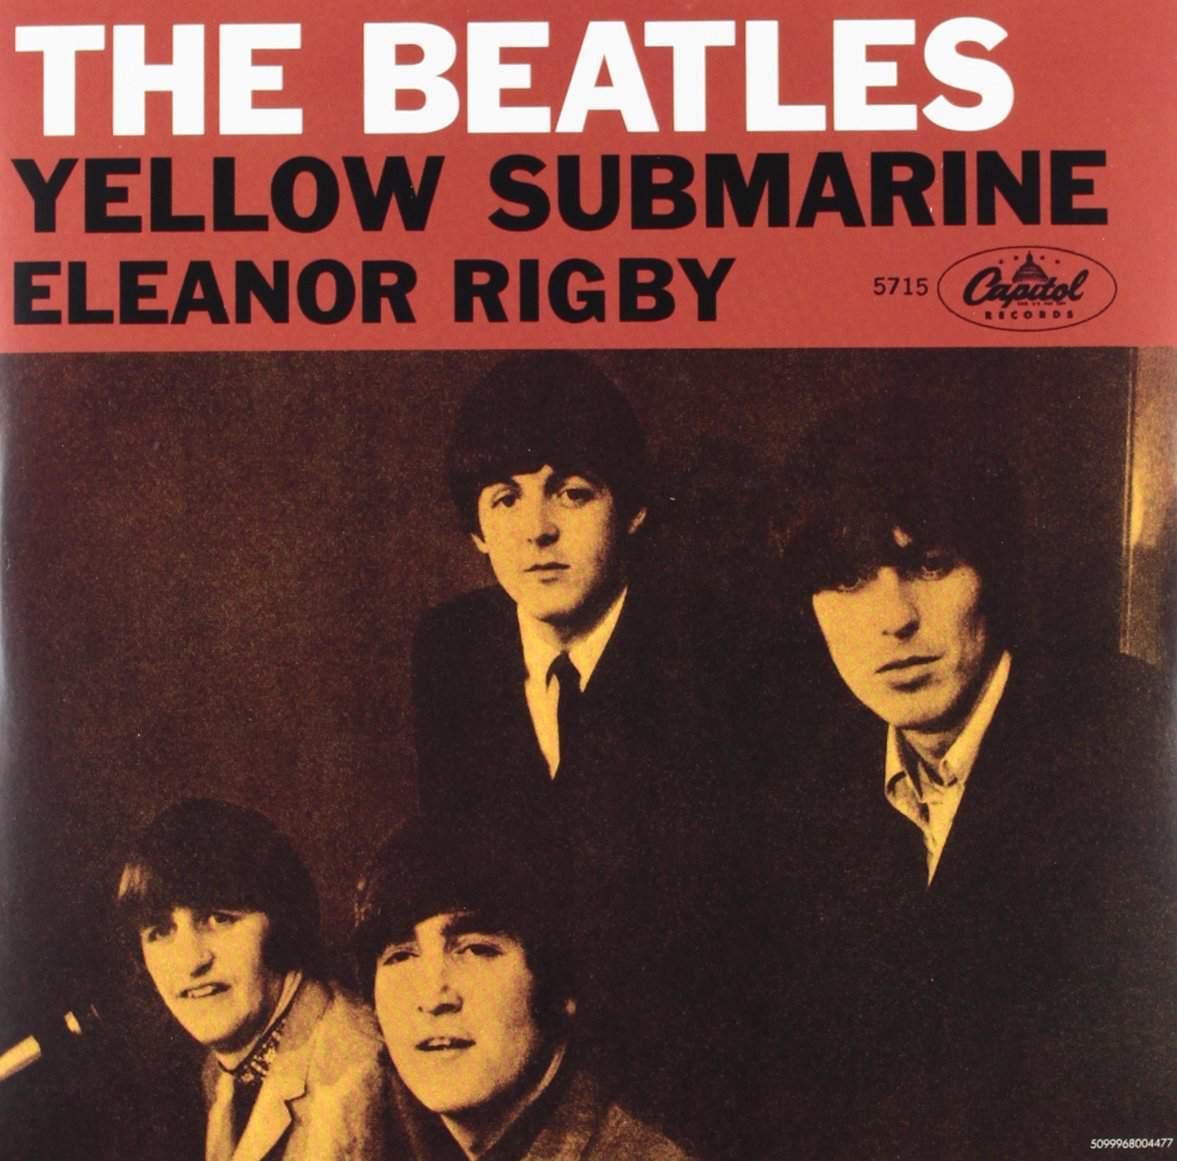 Beatles Yellow Submarine / Eleanor Rigby